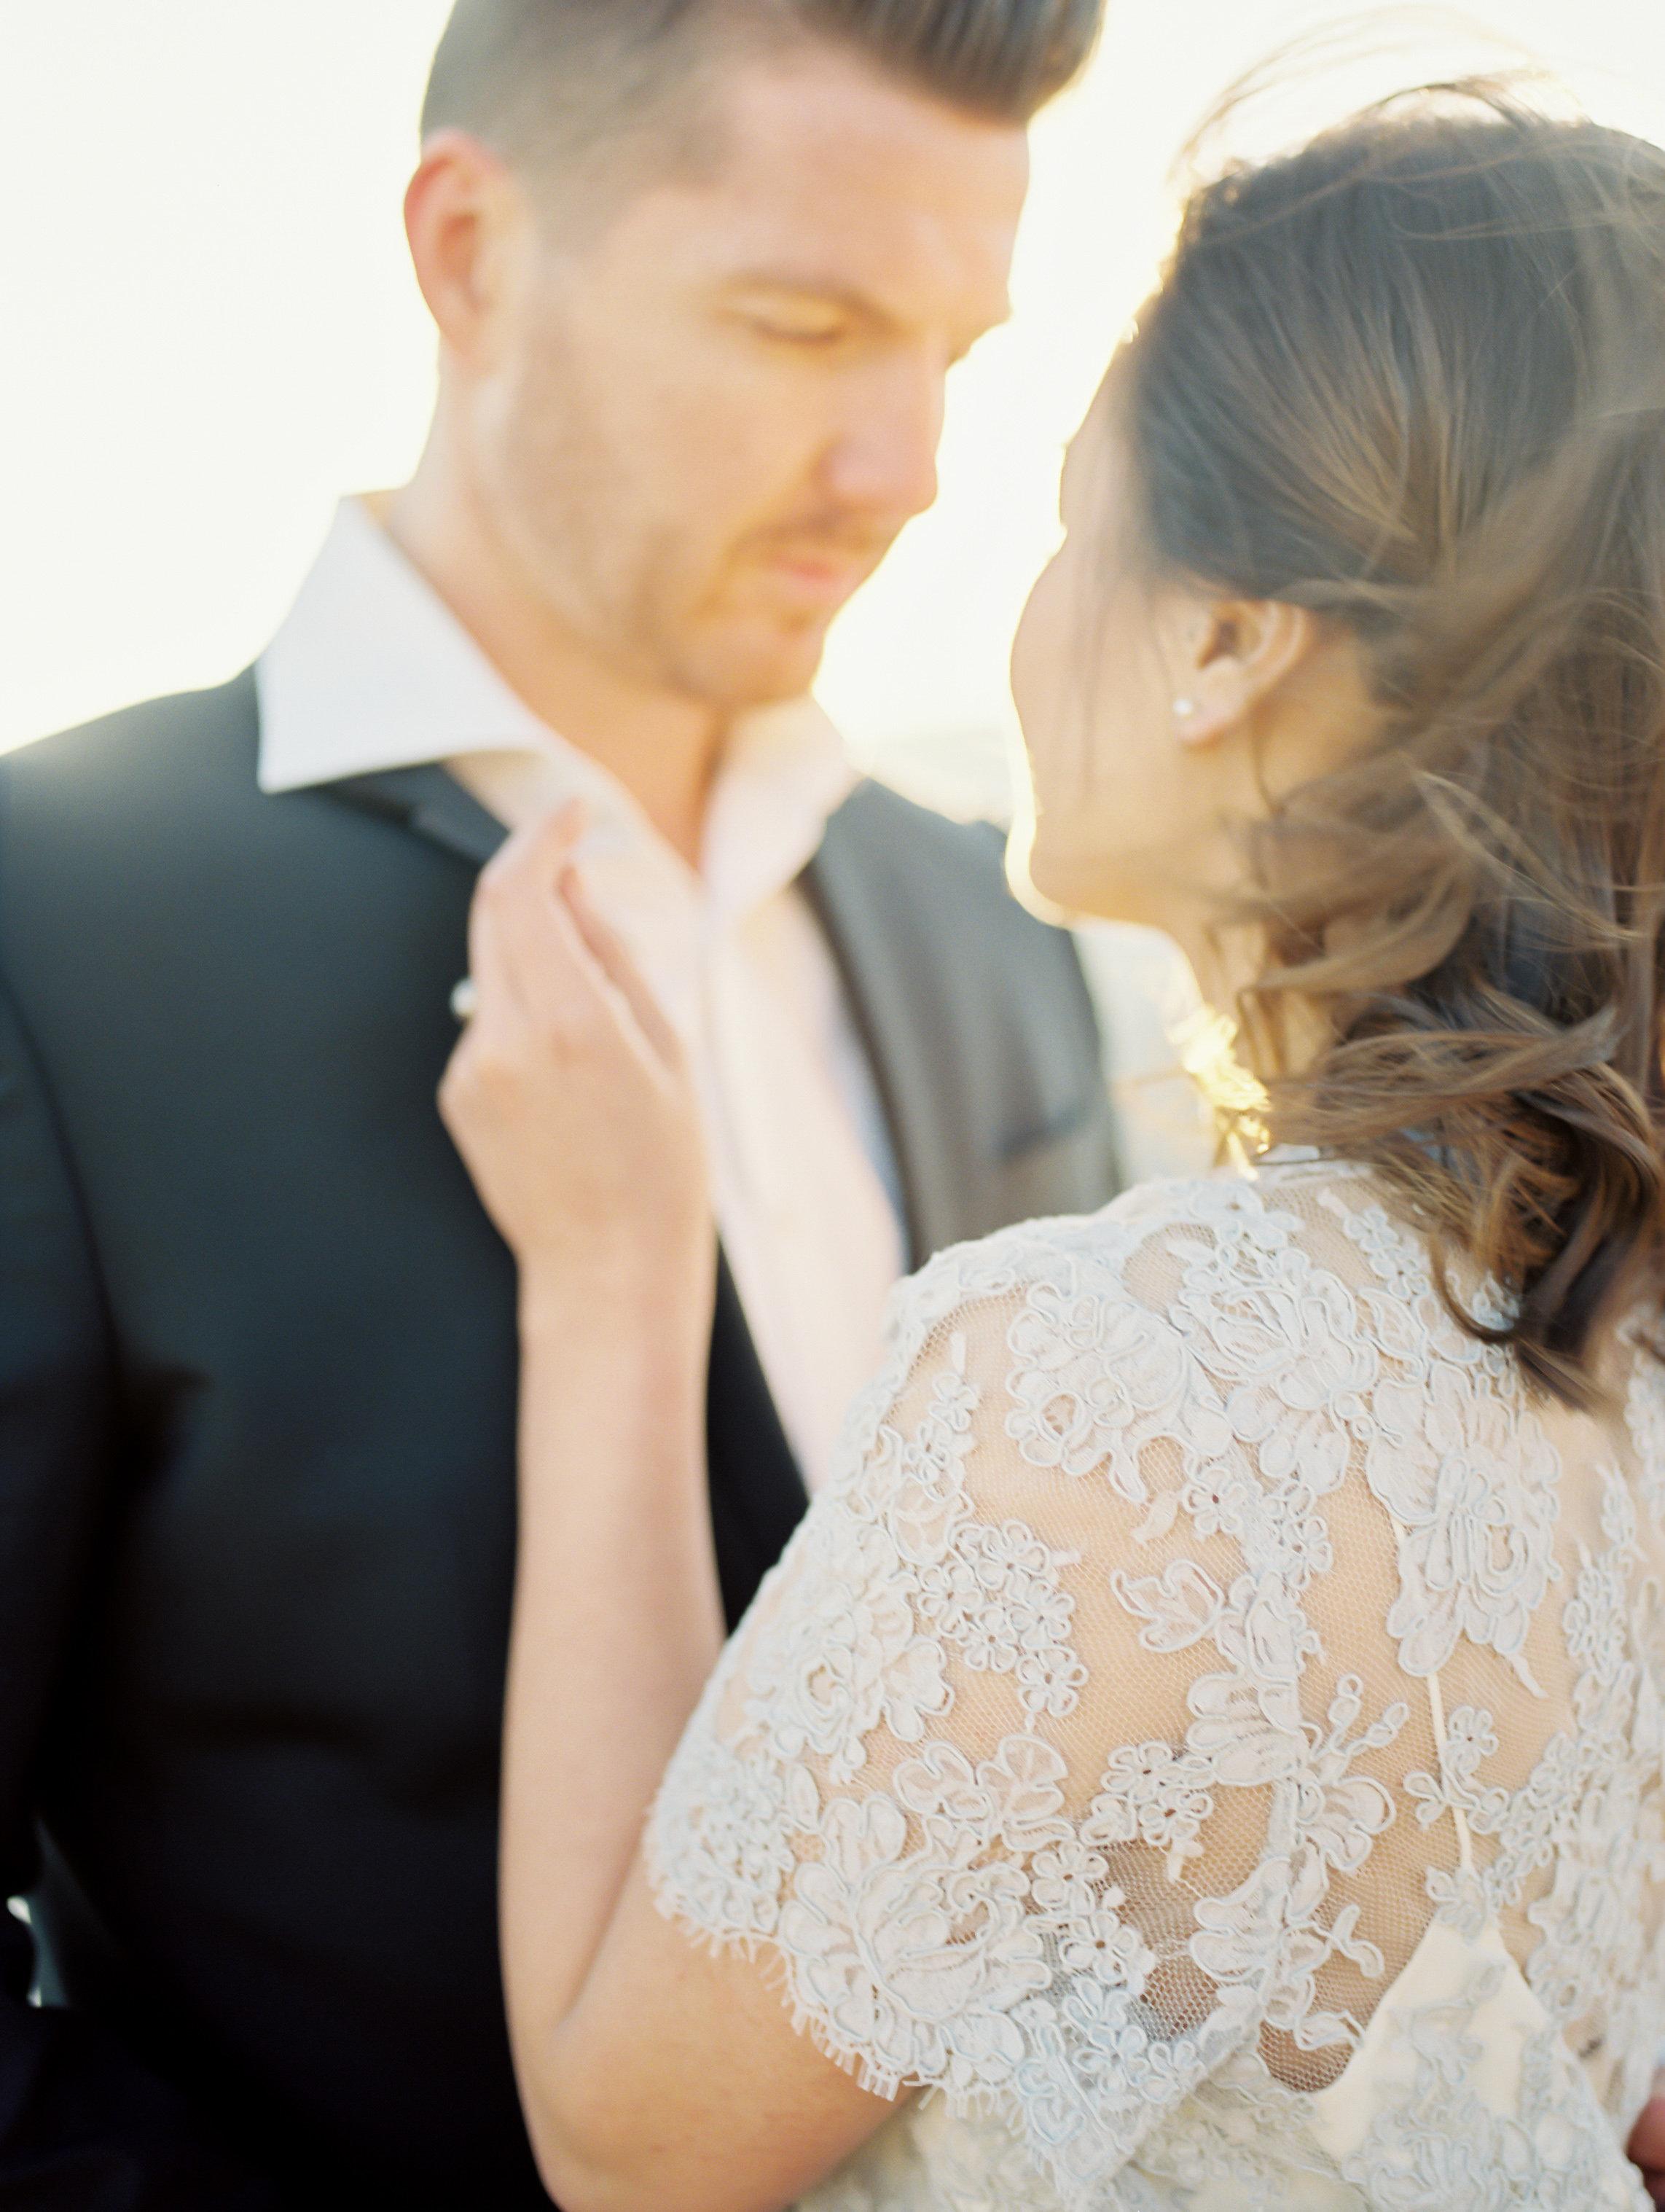 Cliffside-Elopement-Destination-Wedding-Magnolia-Rouge73.jpg